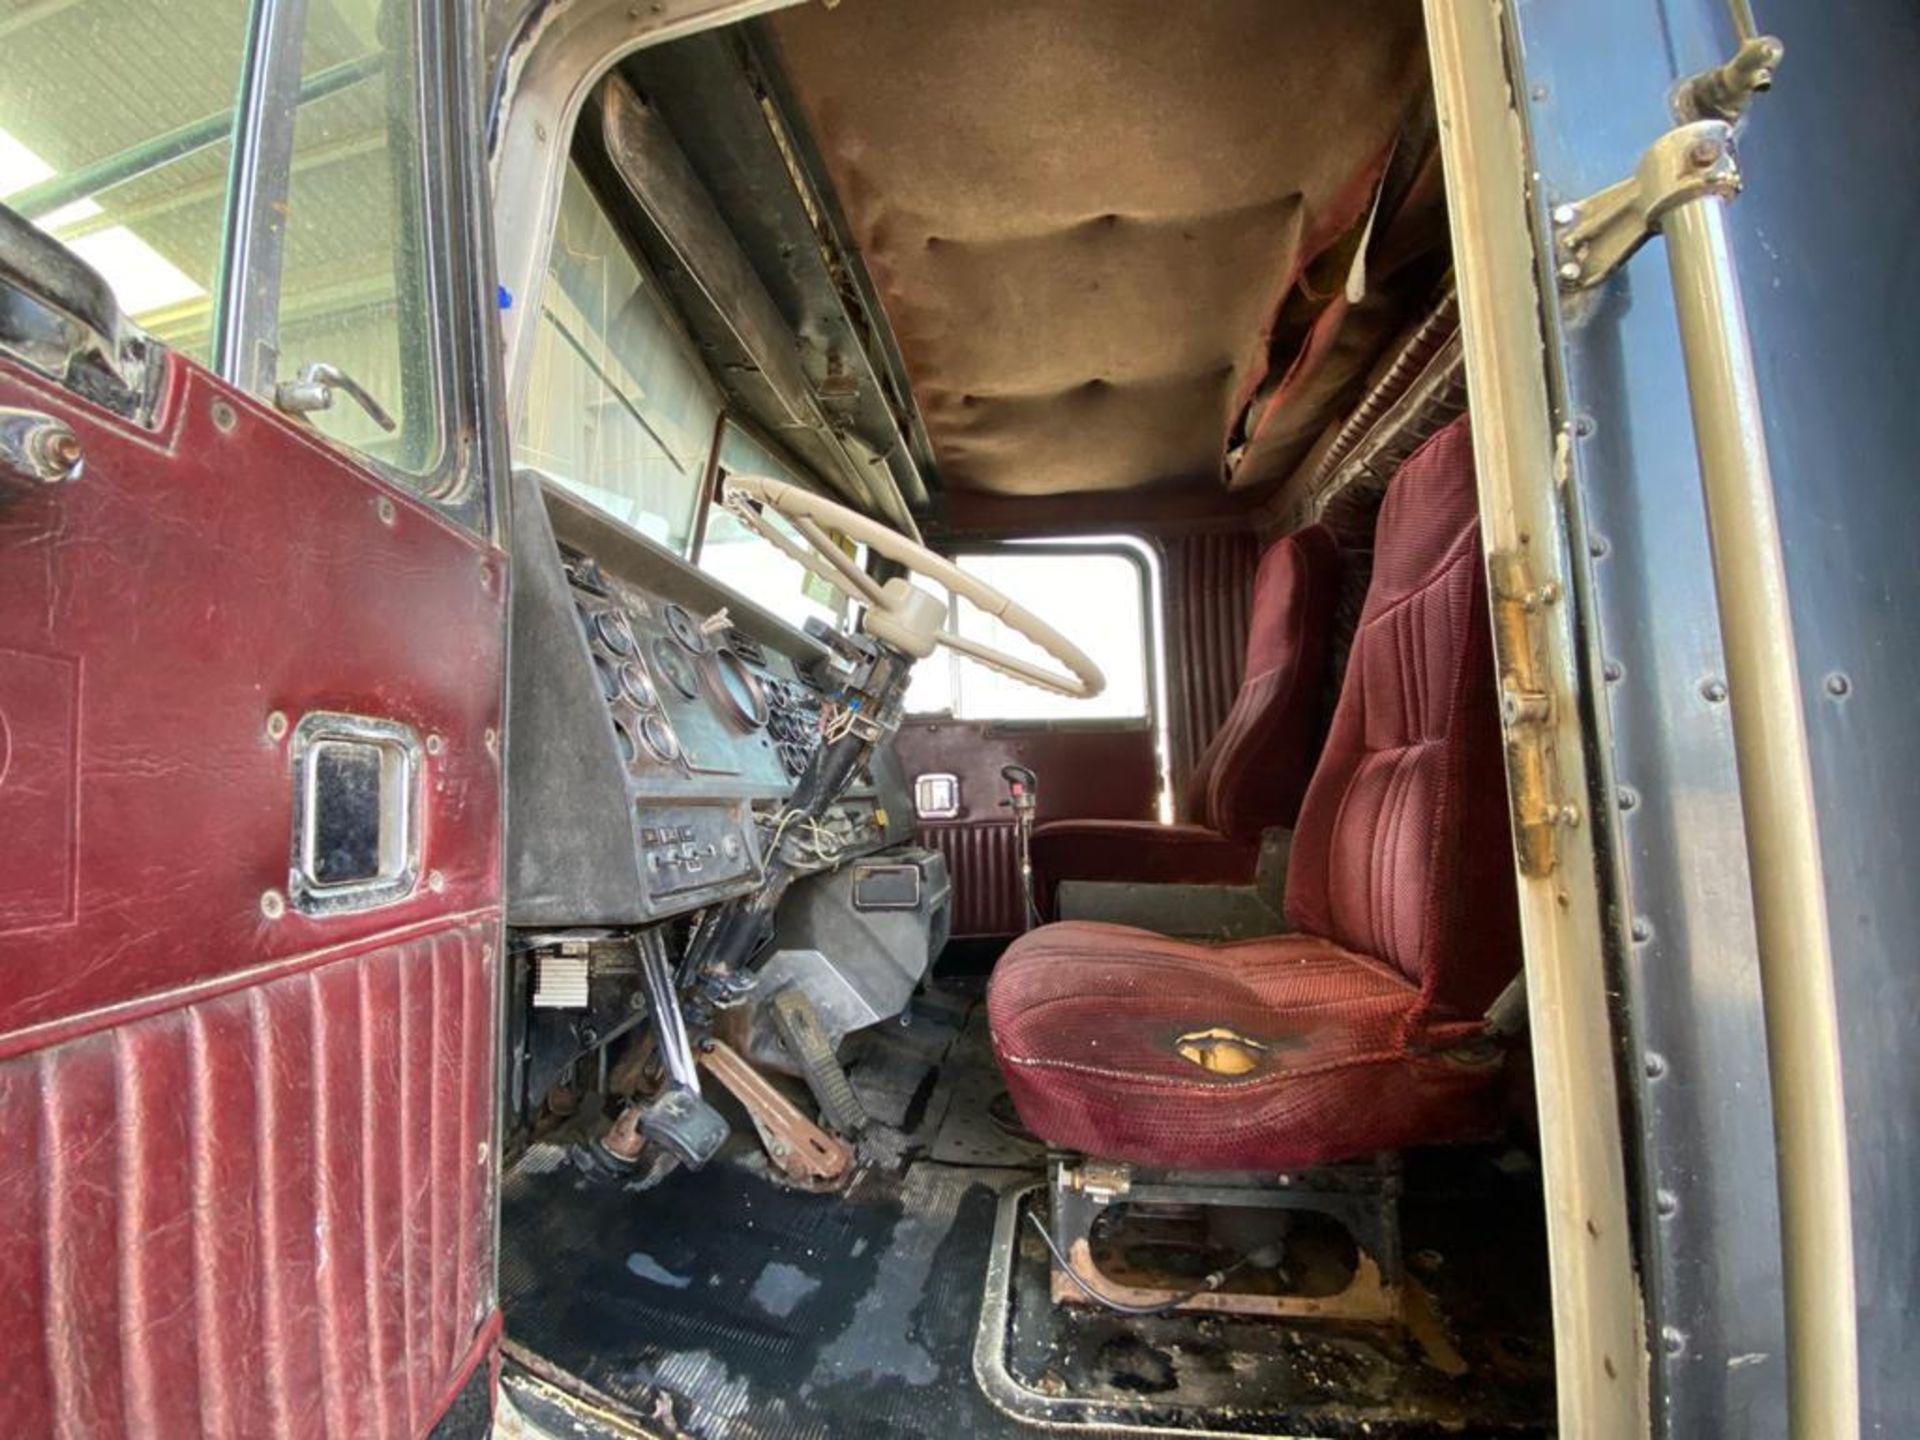 1983 Kenworth Dump Truck, standard transmission of 10 speeds, with Cummins motor - Image 33 of 68